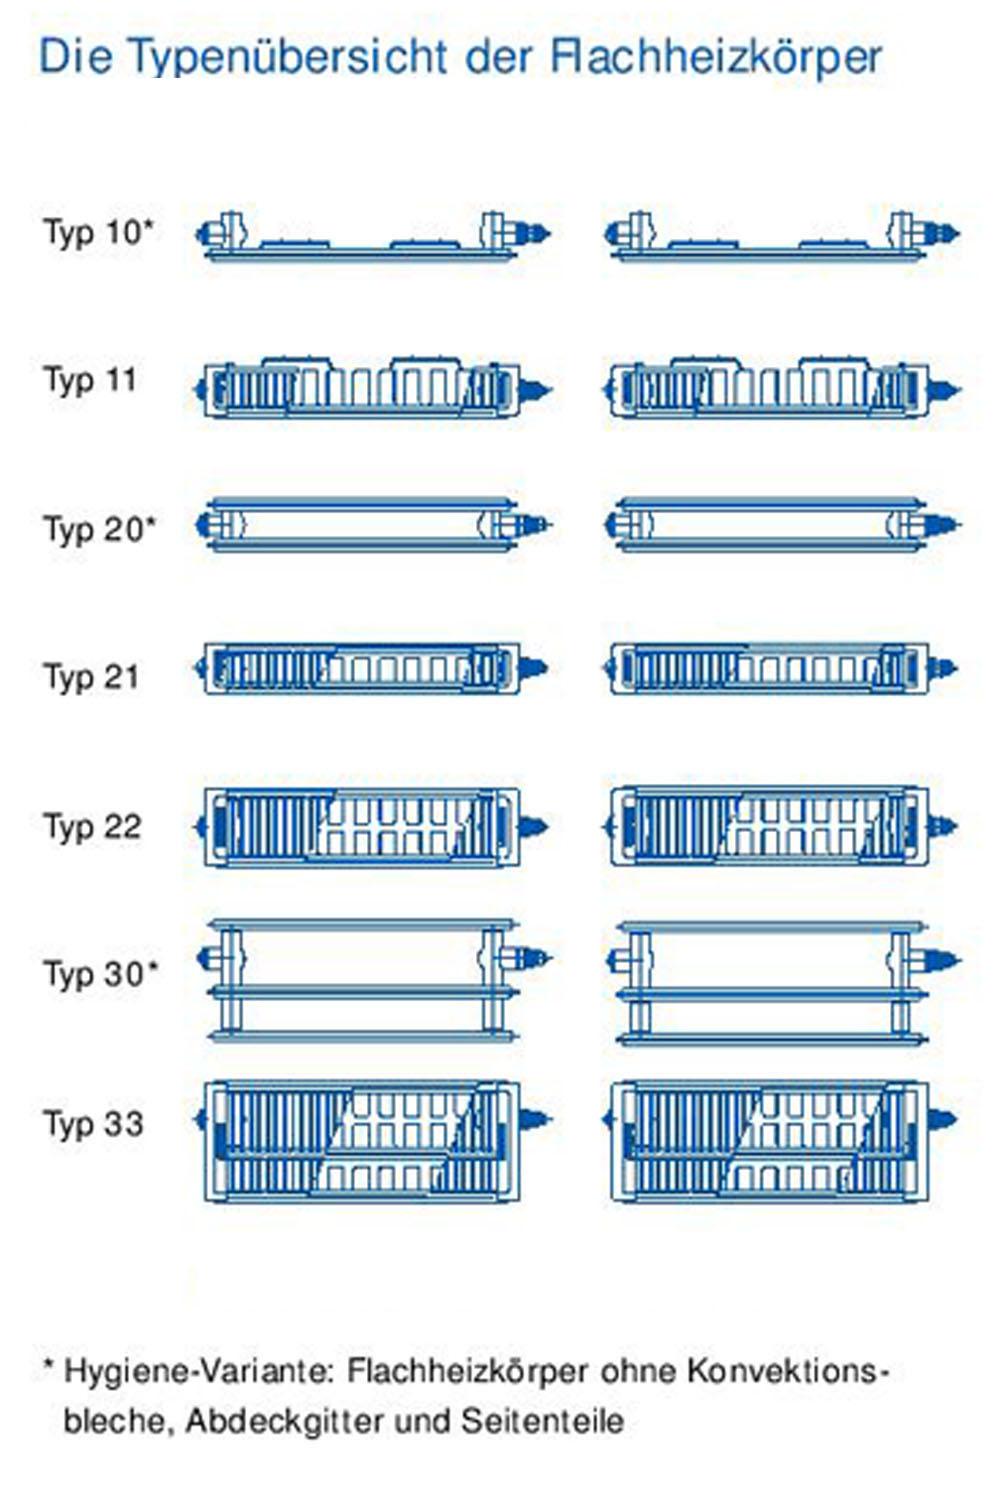 Extrem Buderus Kompakt C- Plan Heizkörper Bauhöhe 600 mm Typ 10 20 30 IZ72